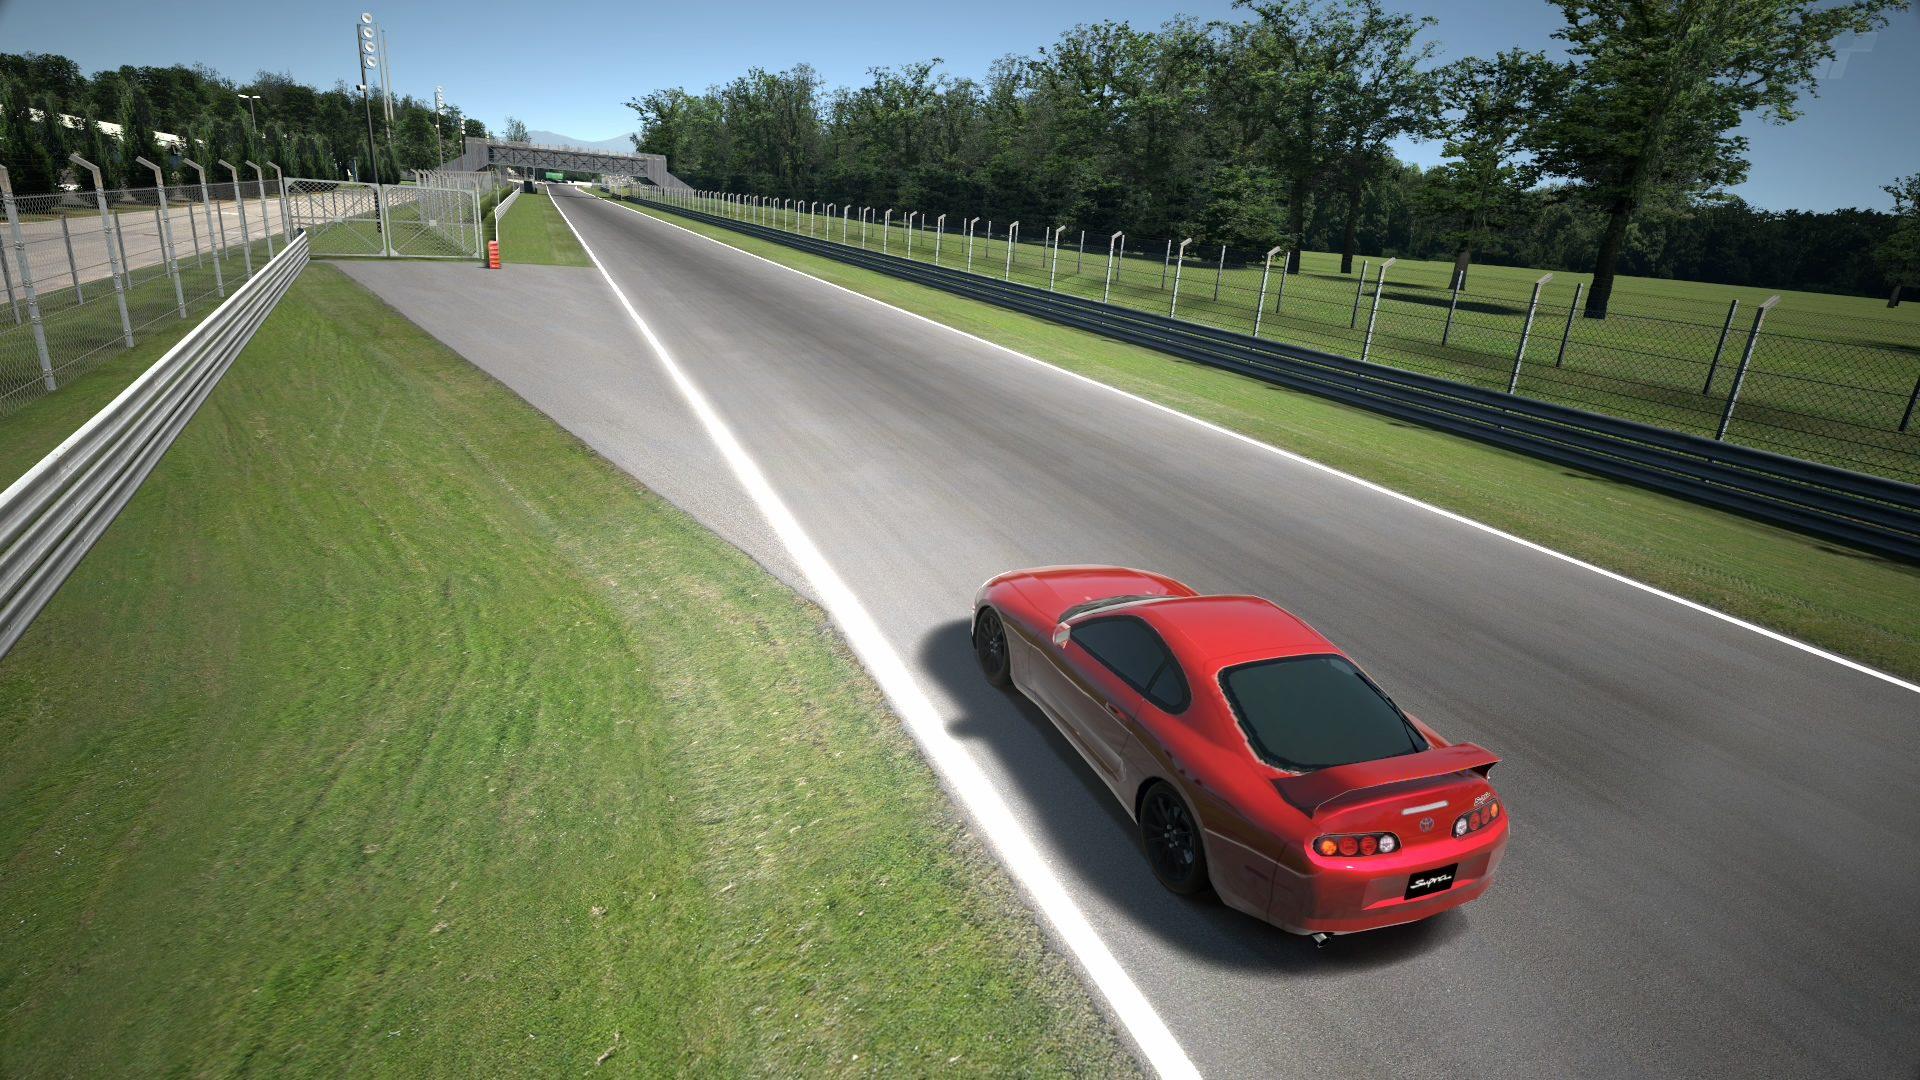 Autodromo Nazionale Monza.jpg